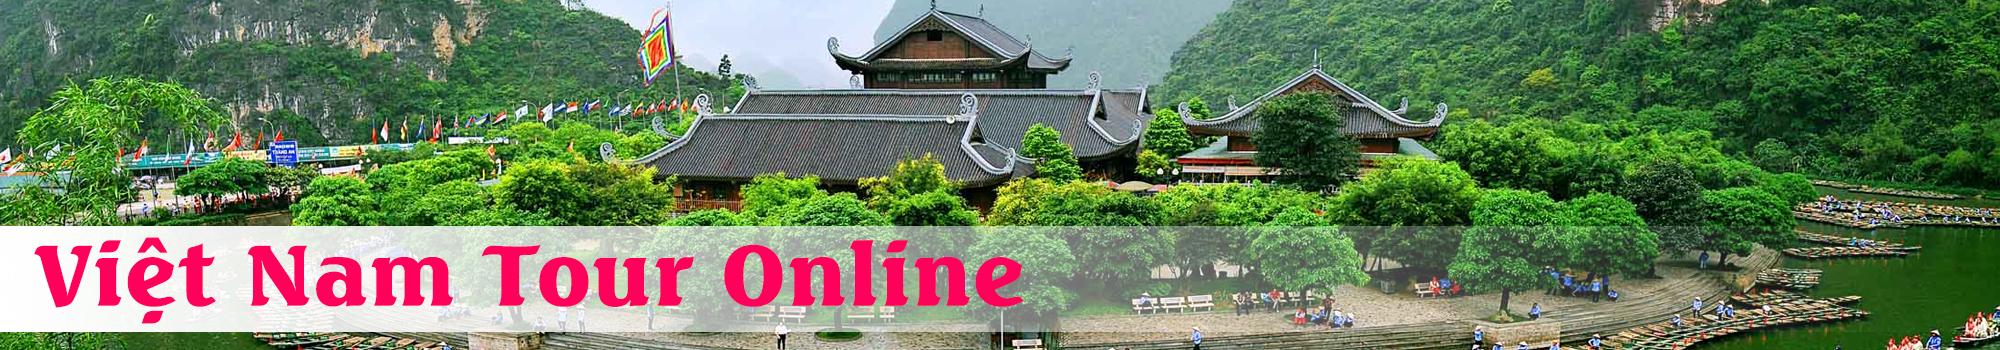 Việt Nam Tour Online